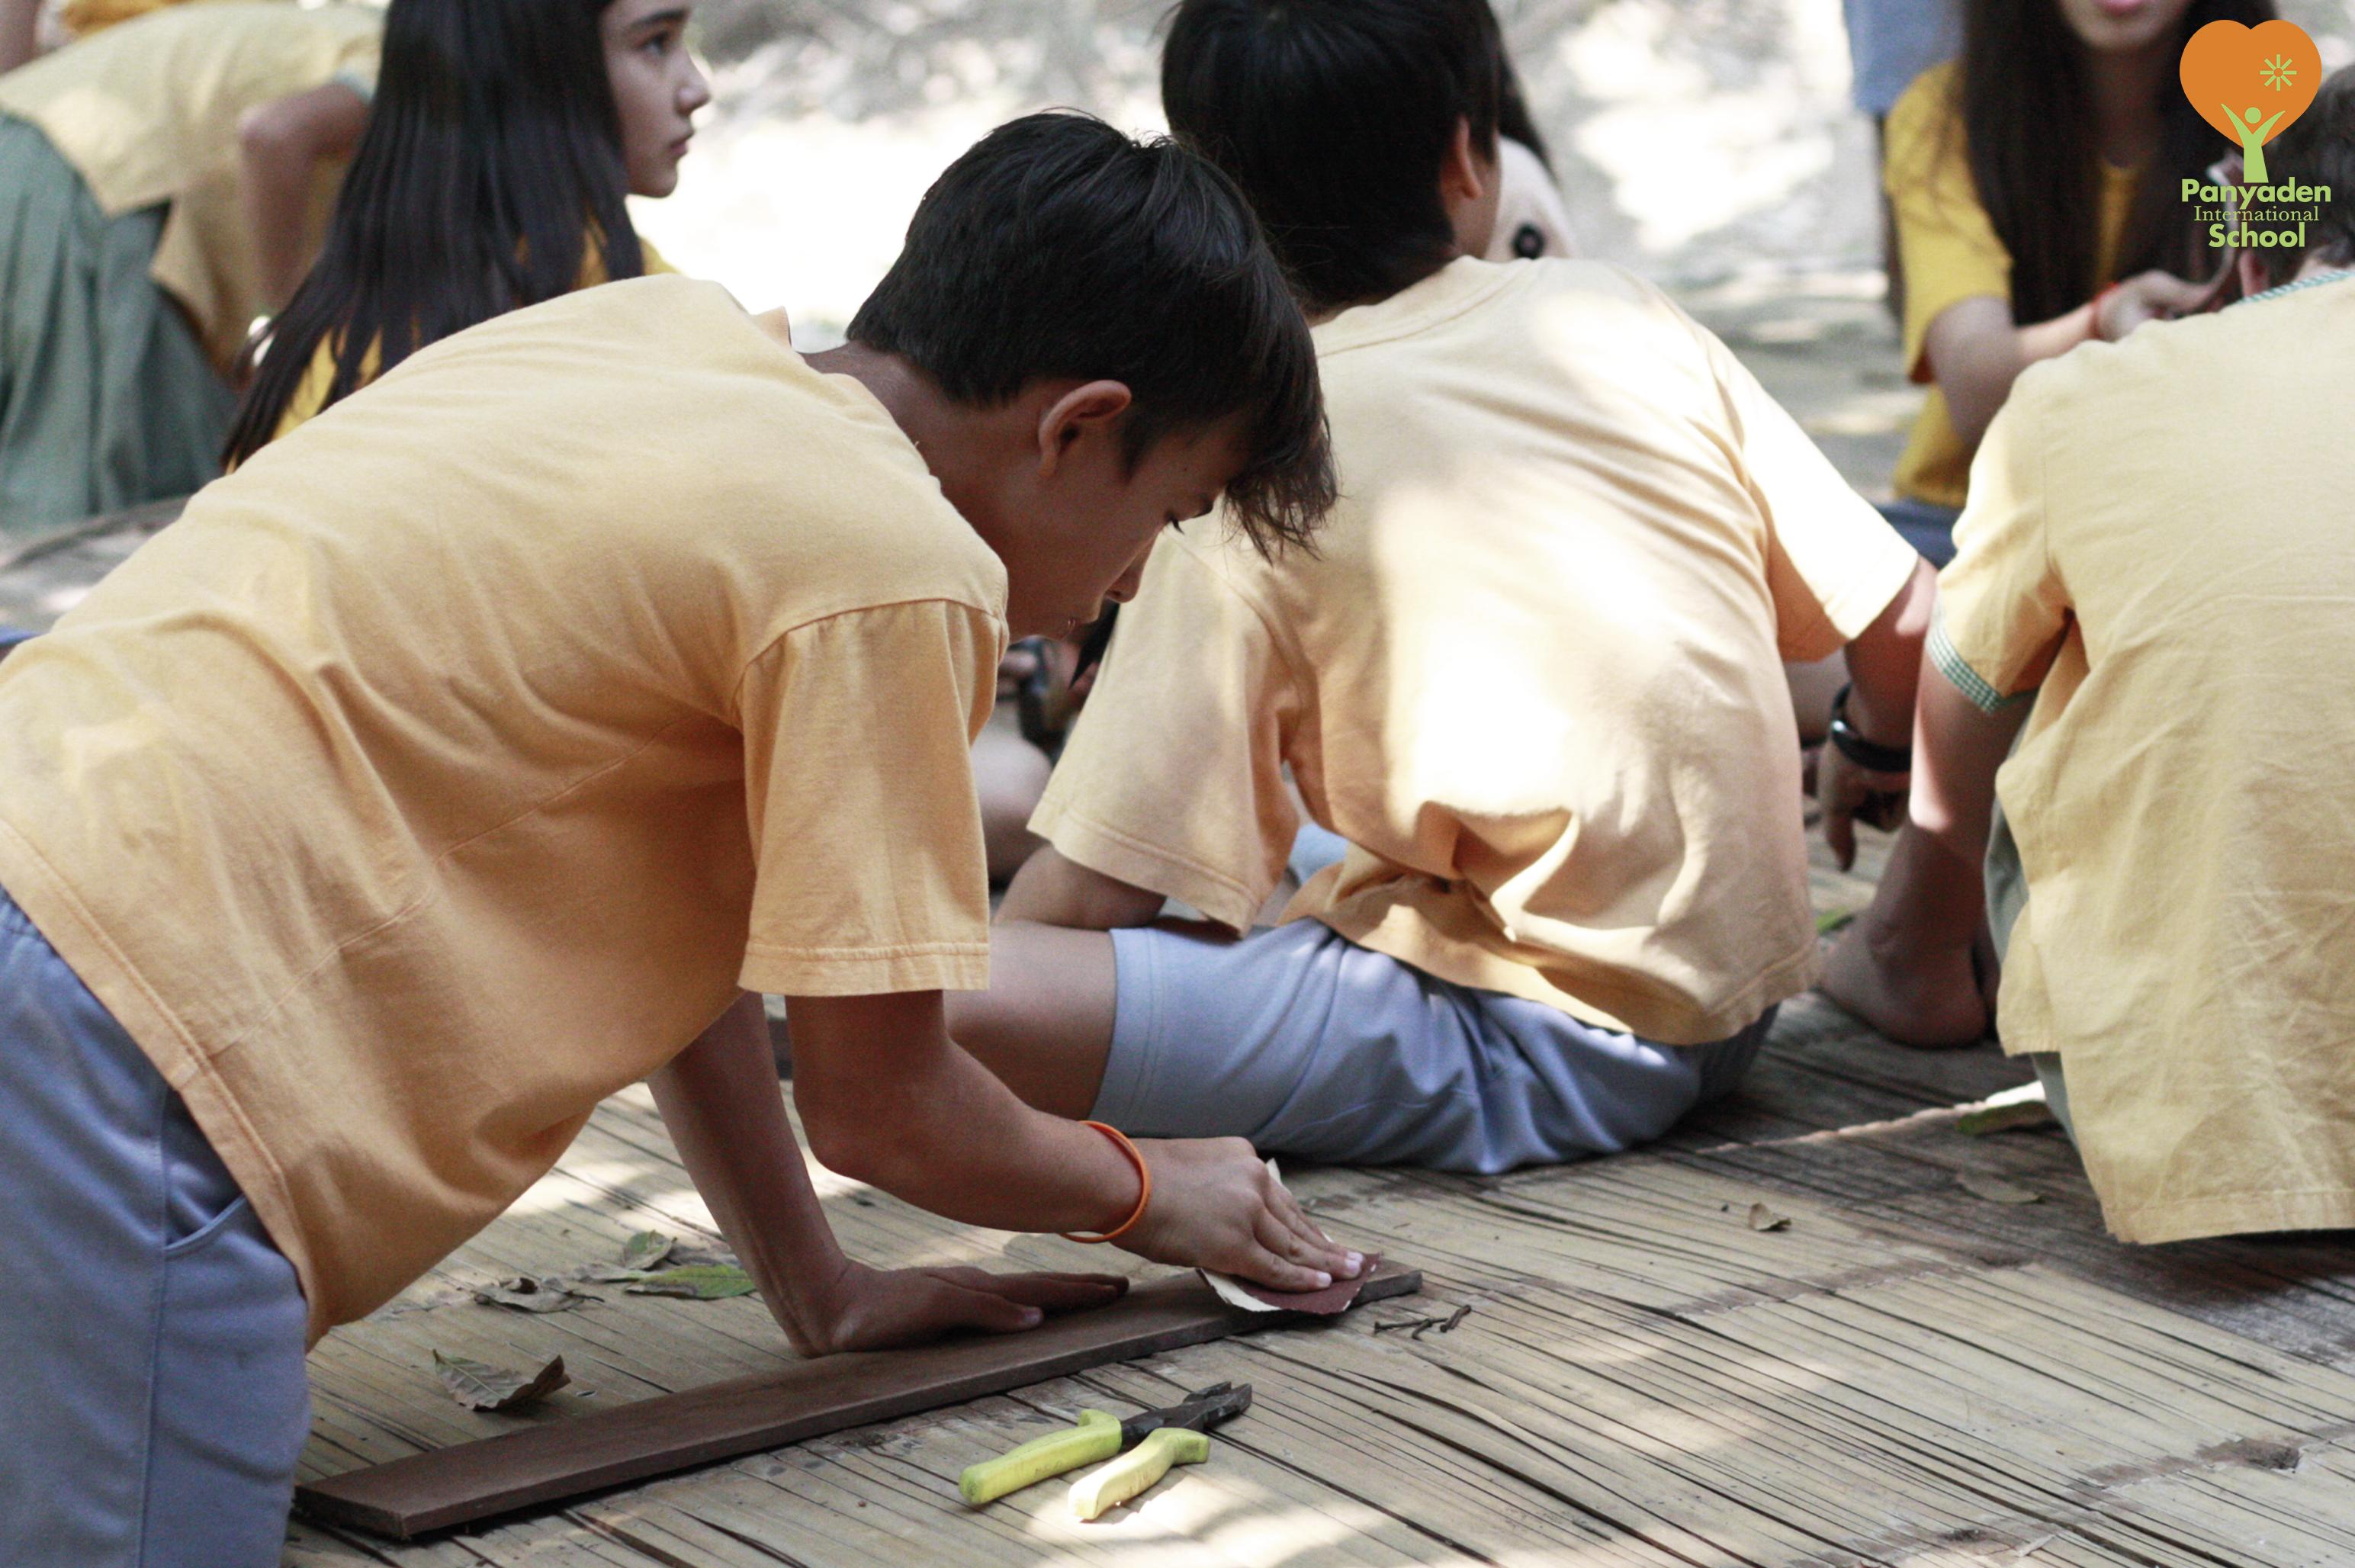 Panyaden Year 6/7 student sanding down wooden signboard for school swimming pool